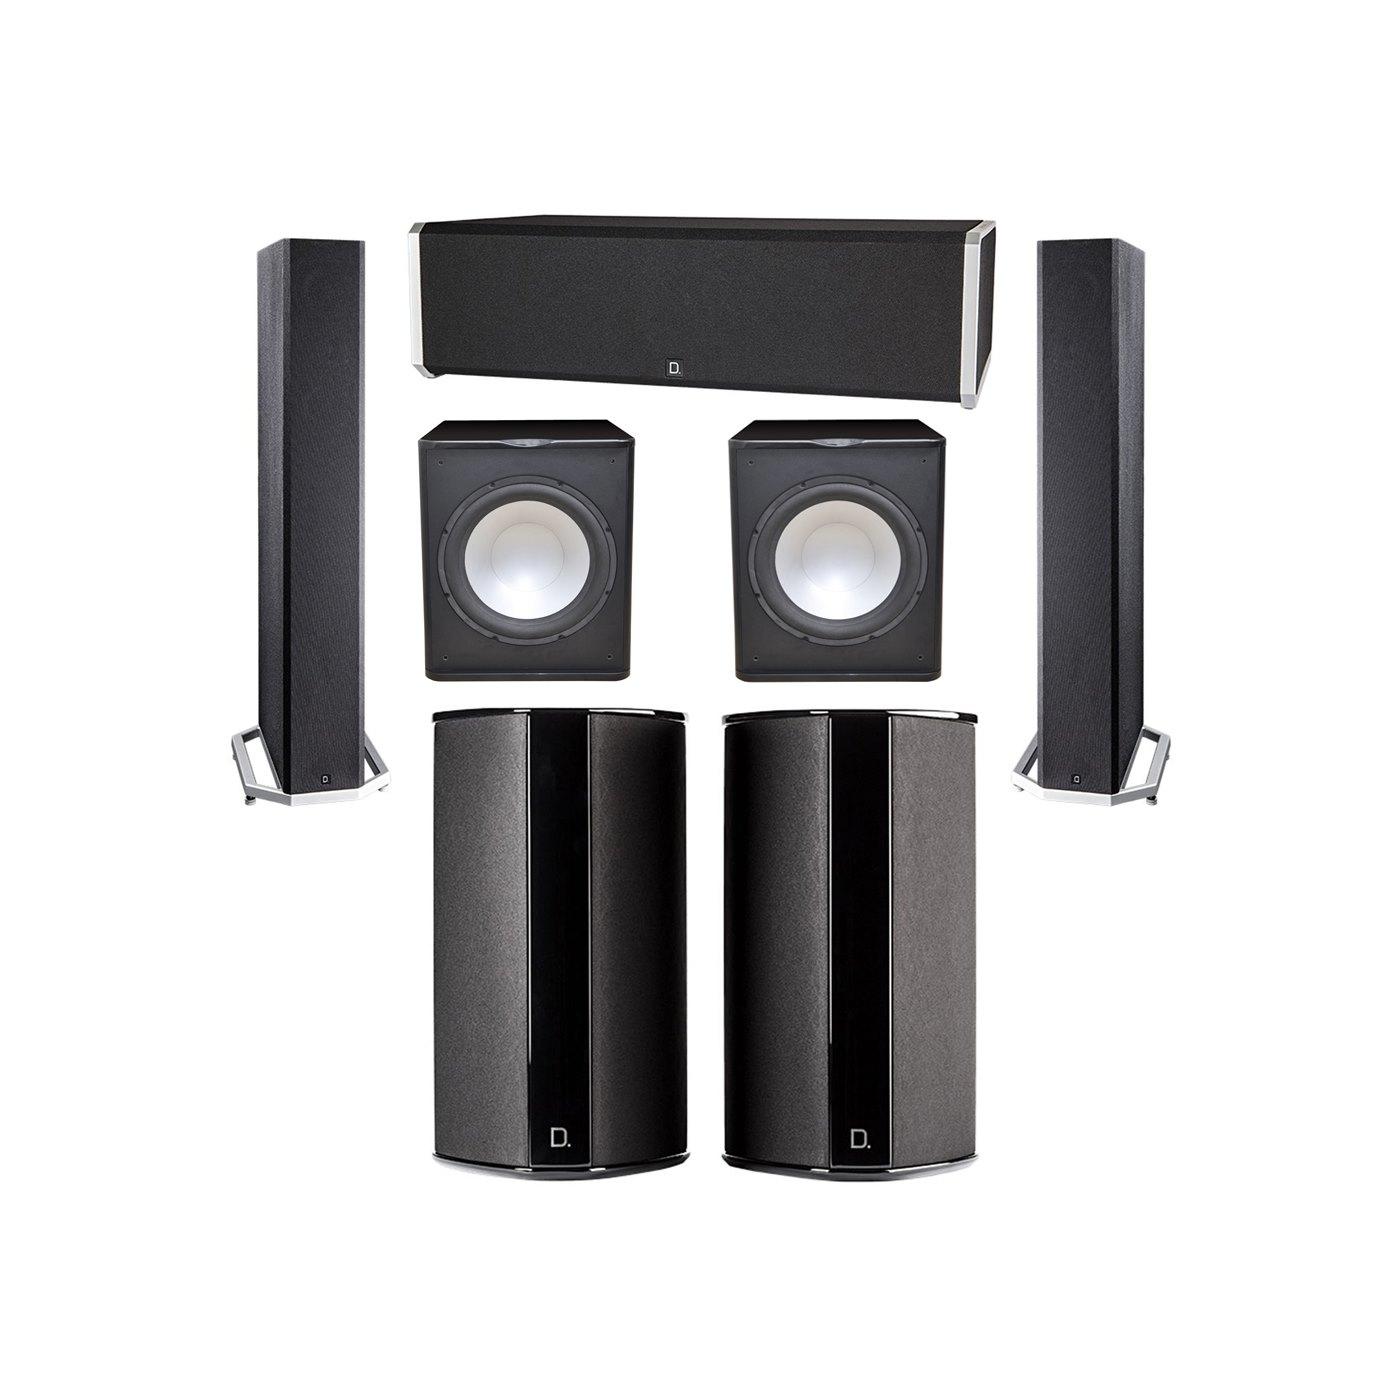 Definitive Technology 5.2 System with 2 BP9040 Tower Speakers, 1 CS9040 Center Channel Speaker, 2 SR9080 Surround Speaker, 2 Premier Acoustic PA-150 Subwoofer